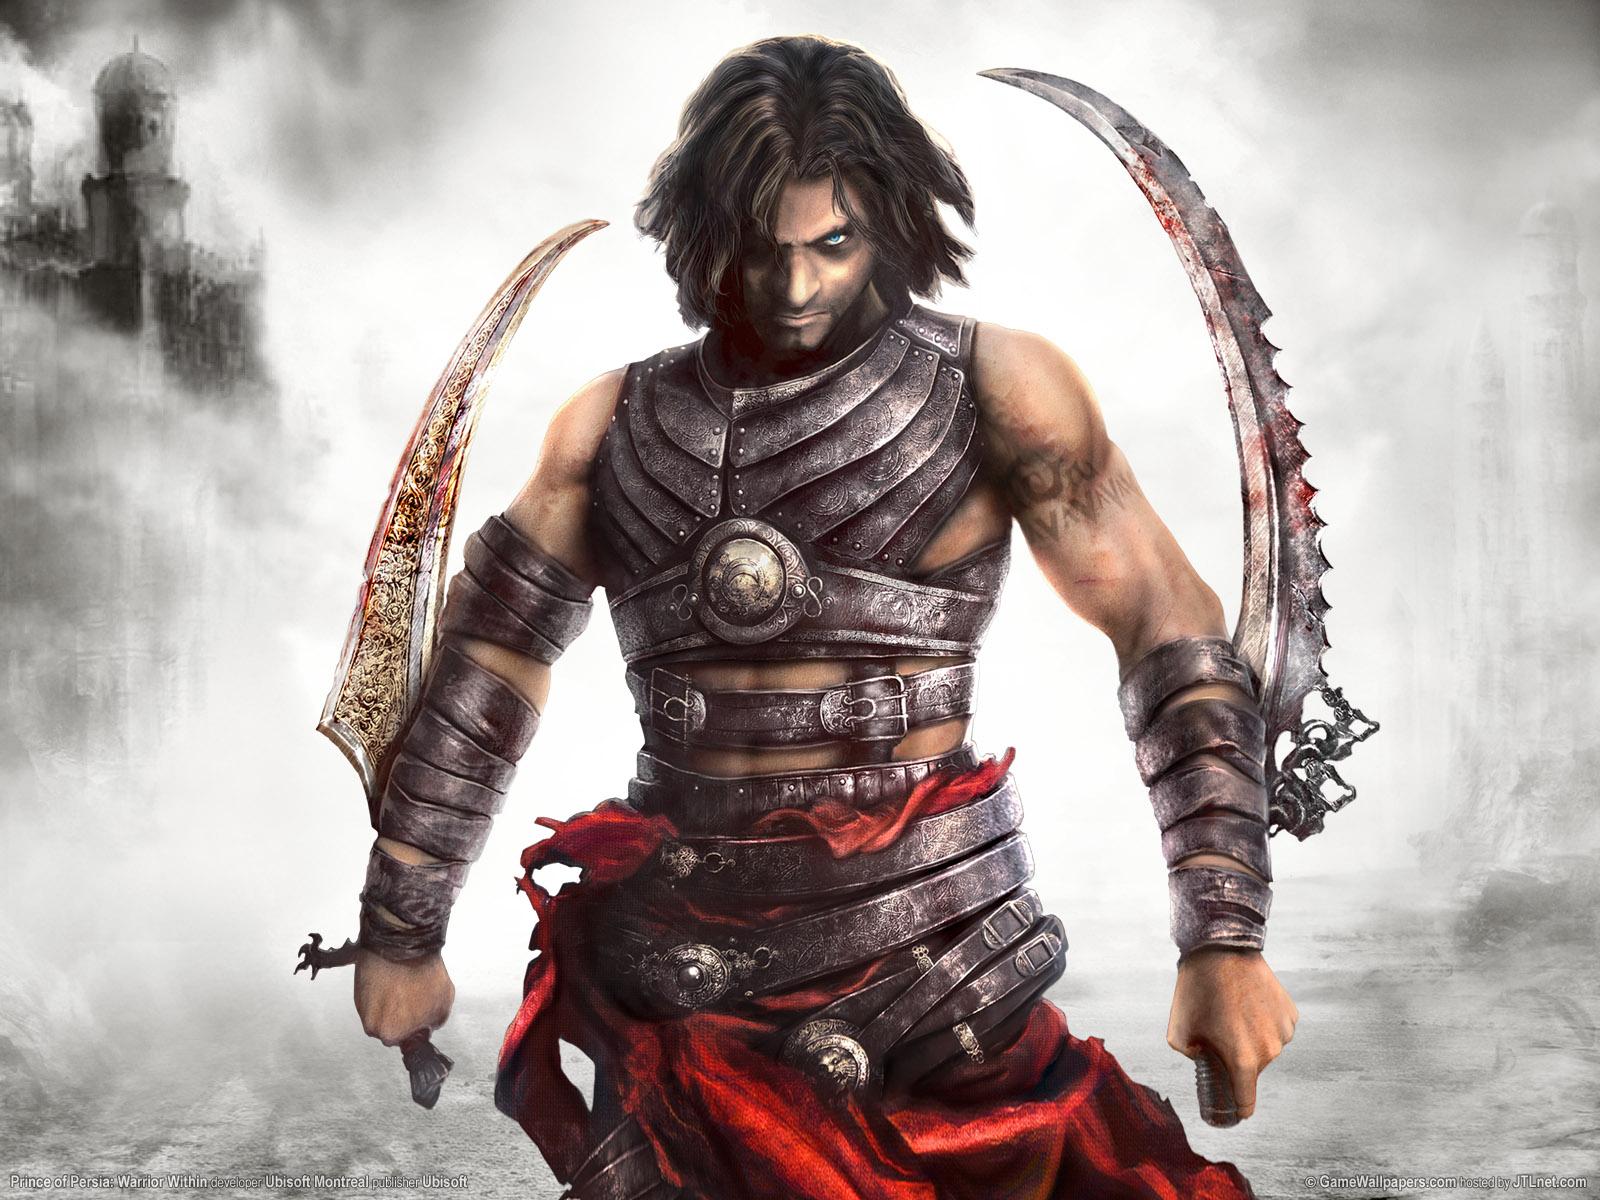 http://1.bp.blogspot.com/_IVU5A-elJUg/S_7lysAmQpI/AAAAAAAABpQ/davVAG-kB0A/s1600/wallpaper_prince_of_persia_warrior_within_10_1600.jpg